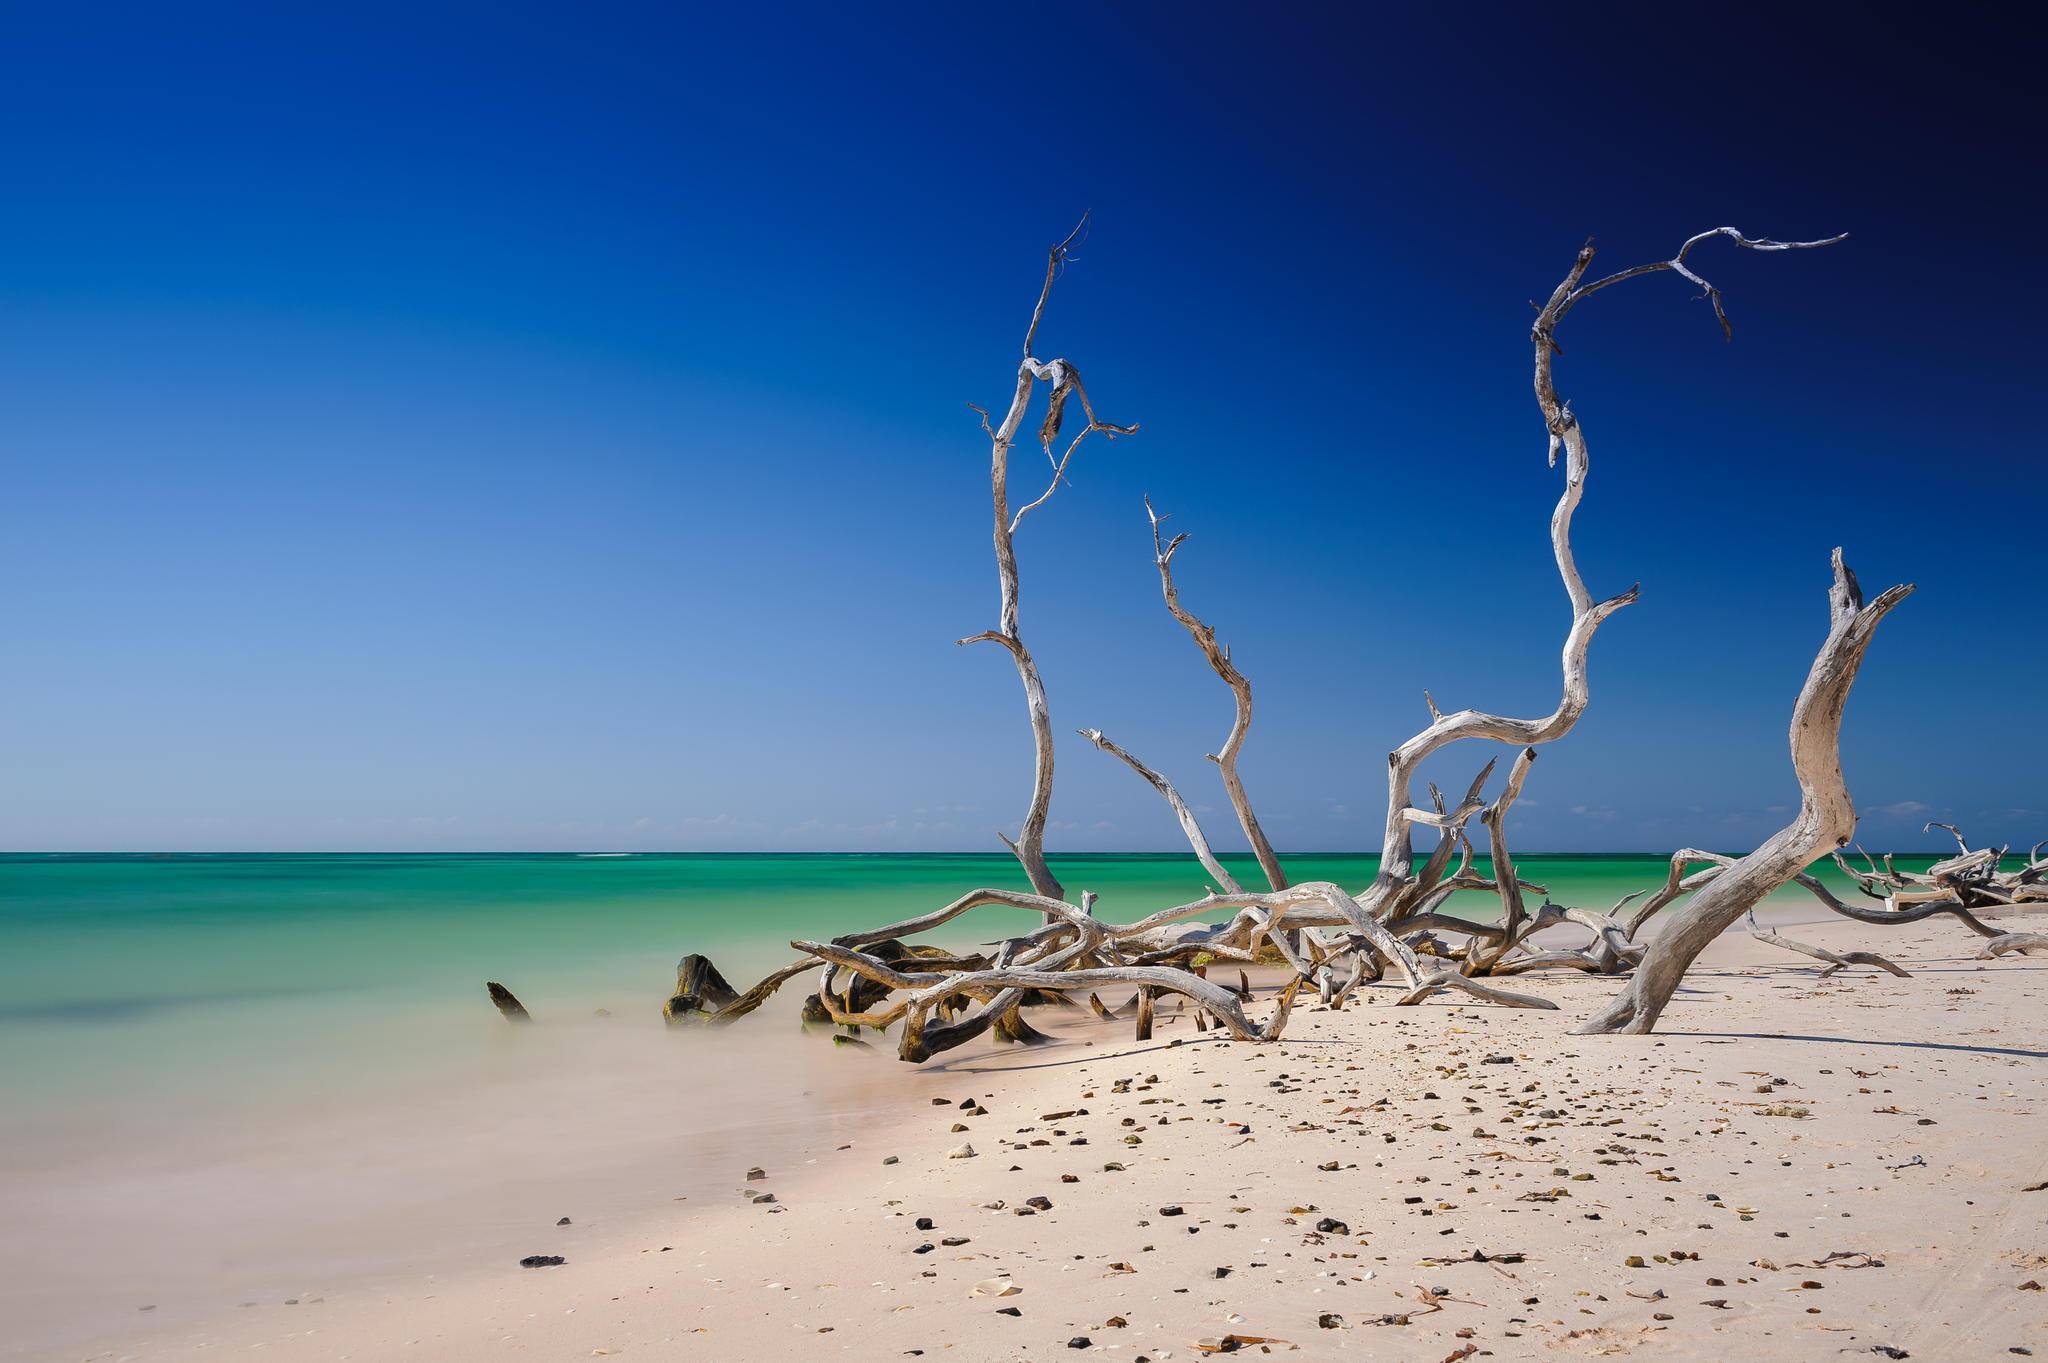 sky caribbean sand beach nature Cuba blue beauty scenery sea 2048x1363